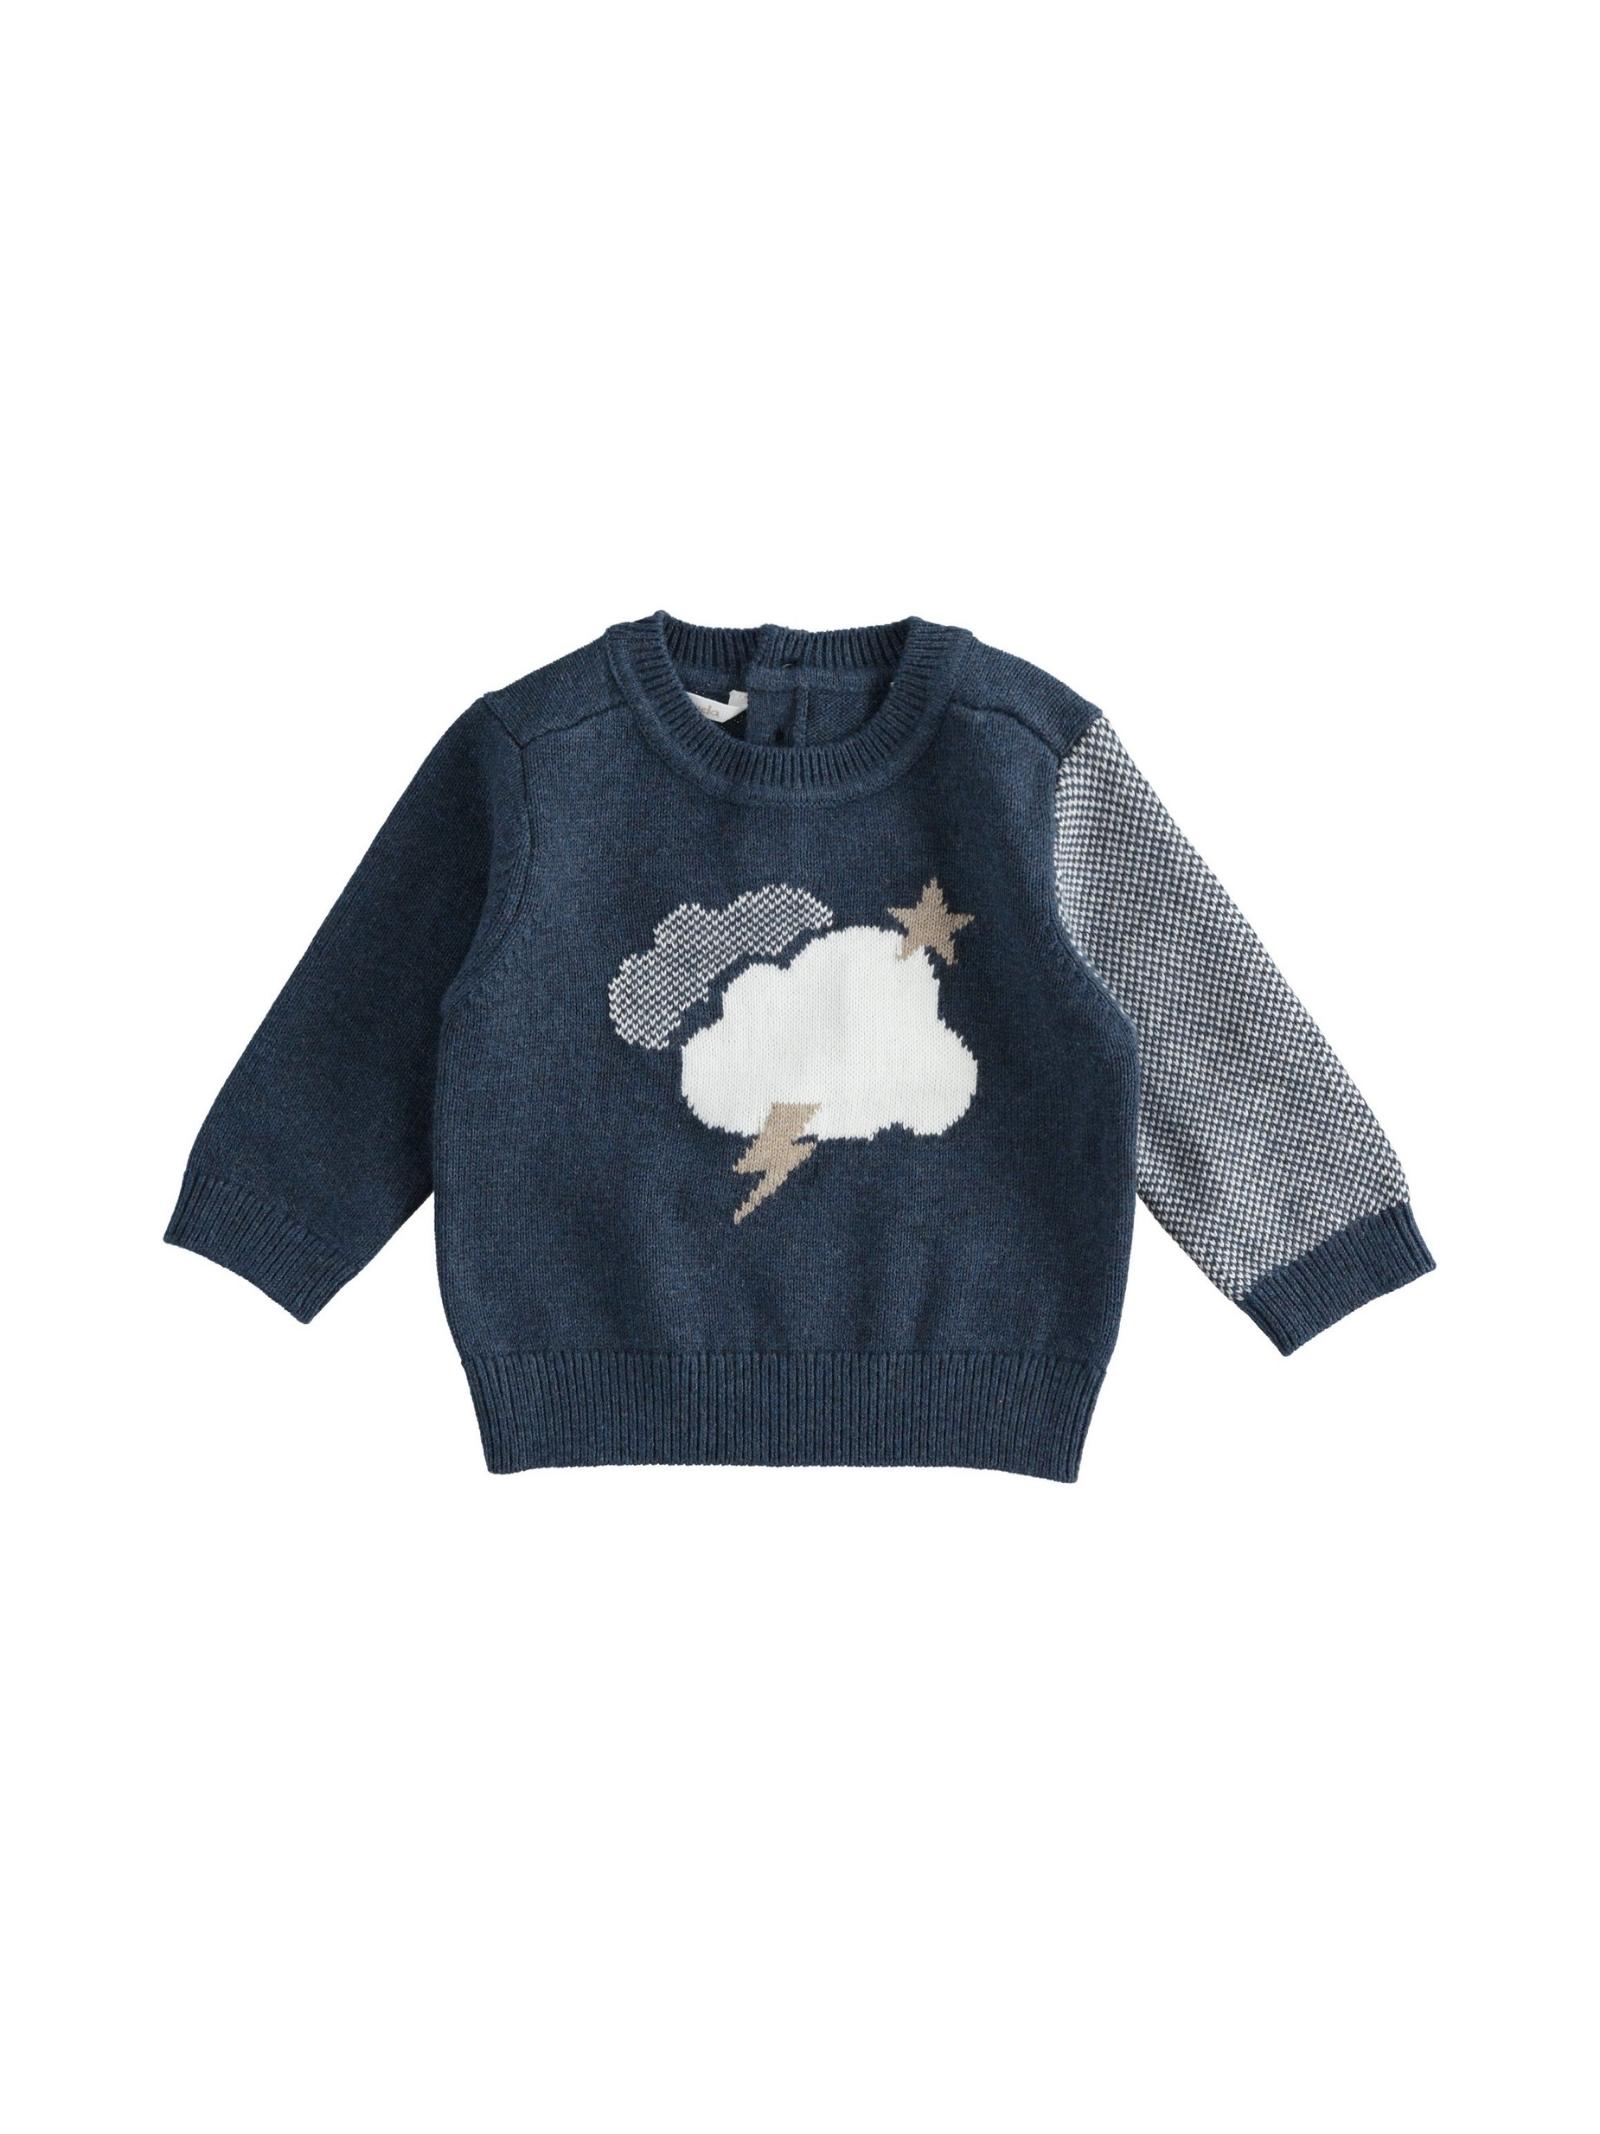 Baby Cloud Sweater MINIBANDA | Sweaters | 33612008953